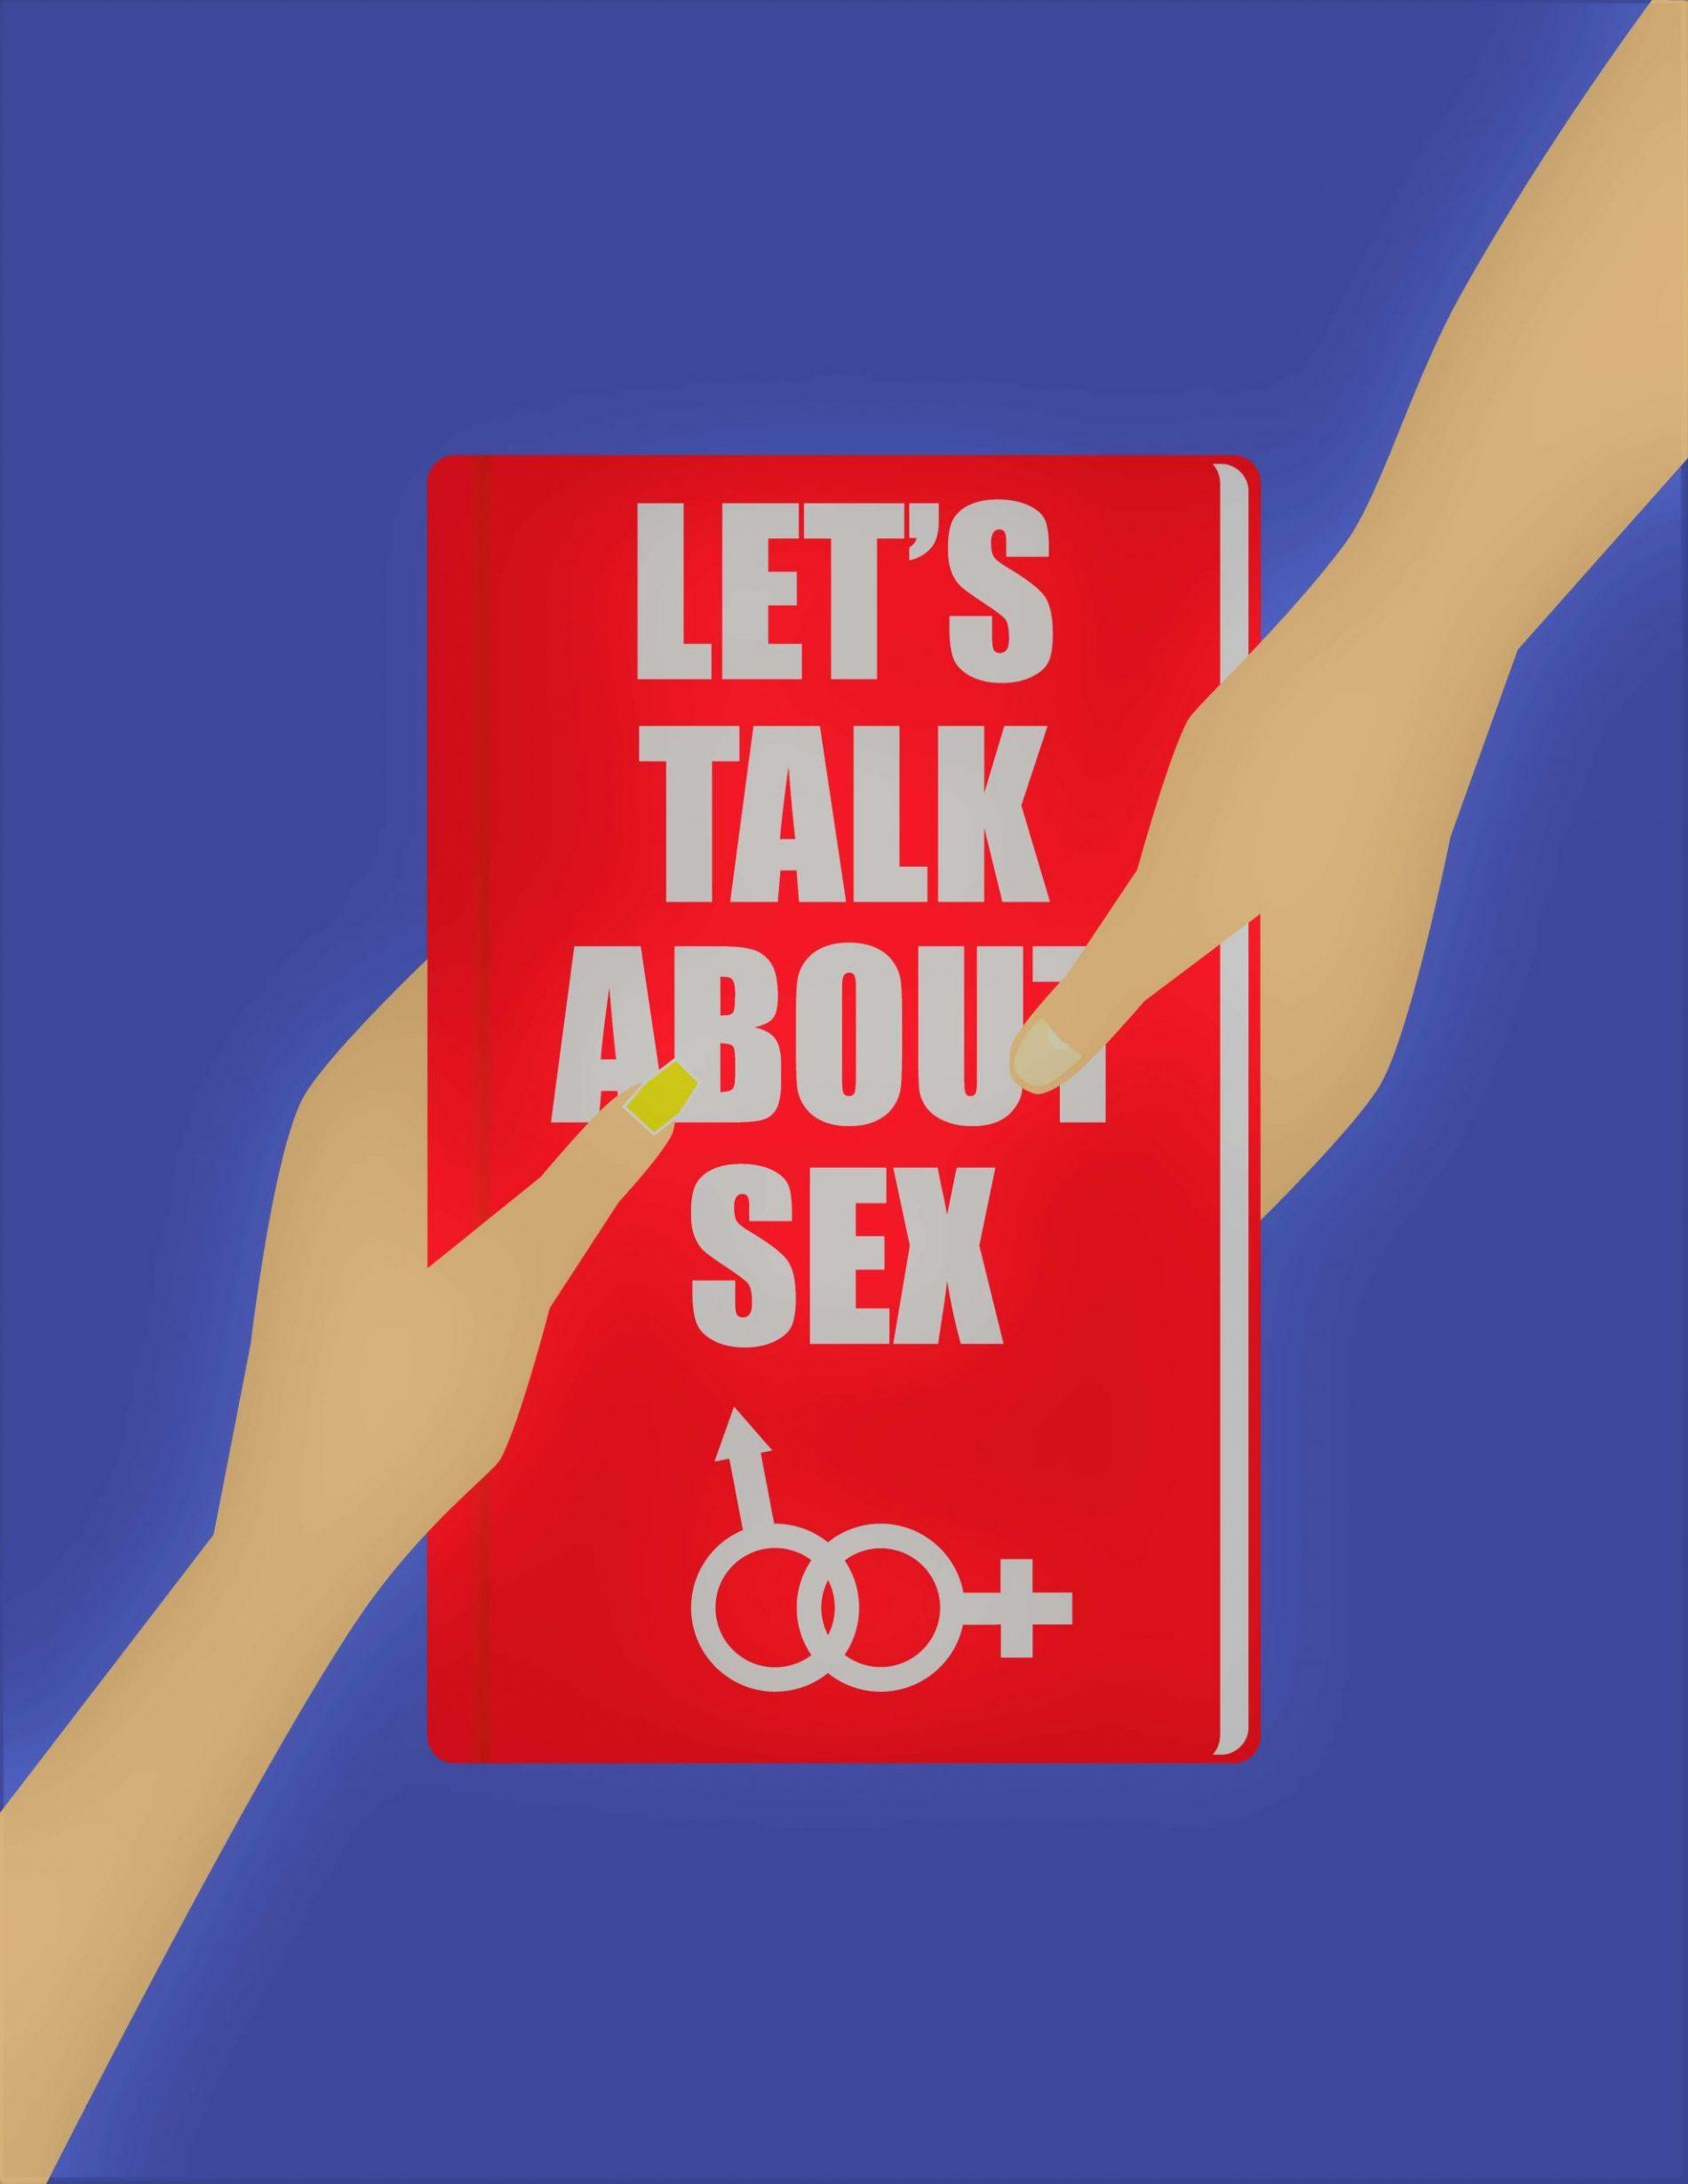 What Kinks Do I Like? 🍭 | BDSM Test | Hannah Witton